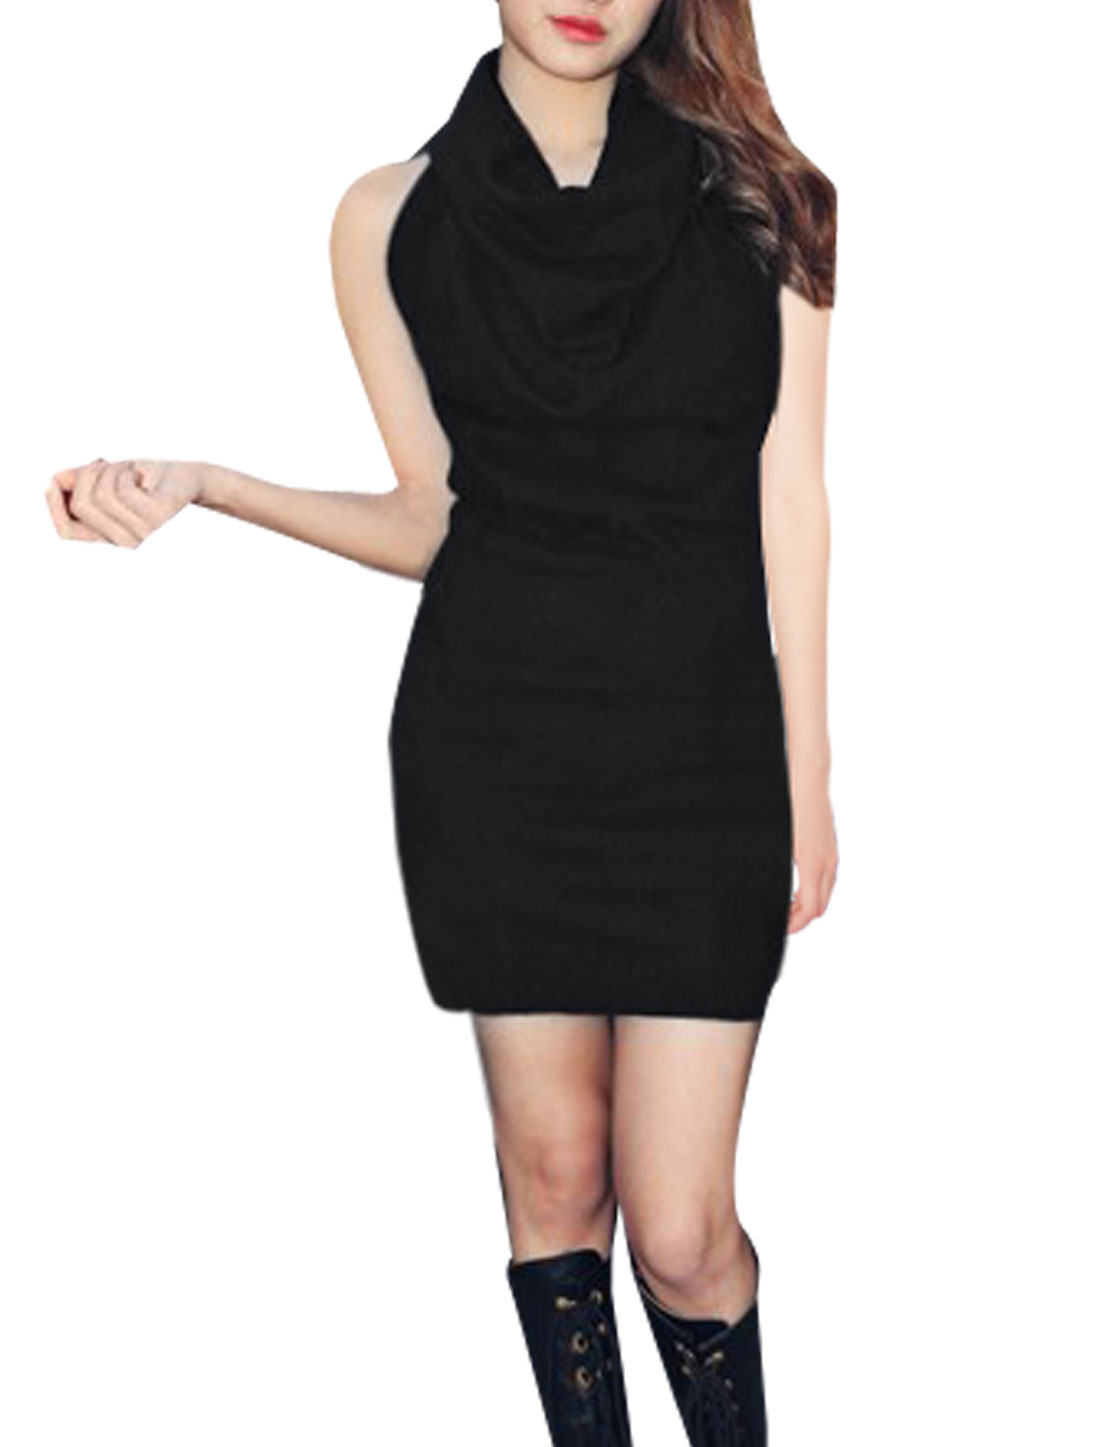 Ladies Cowl Neck Bare Back Stretchy Knitting Black Mini Dress XS